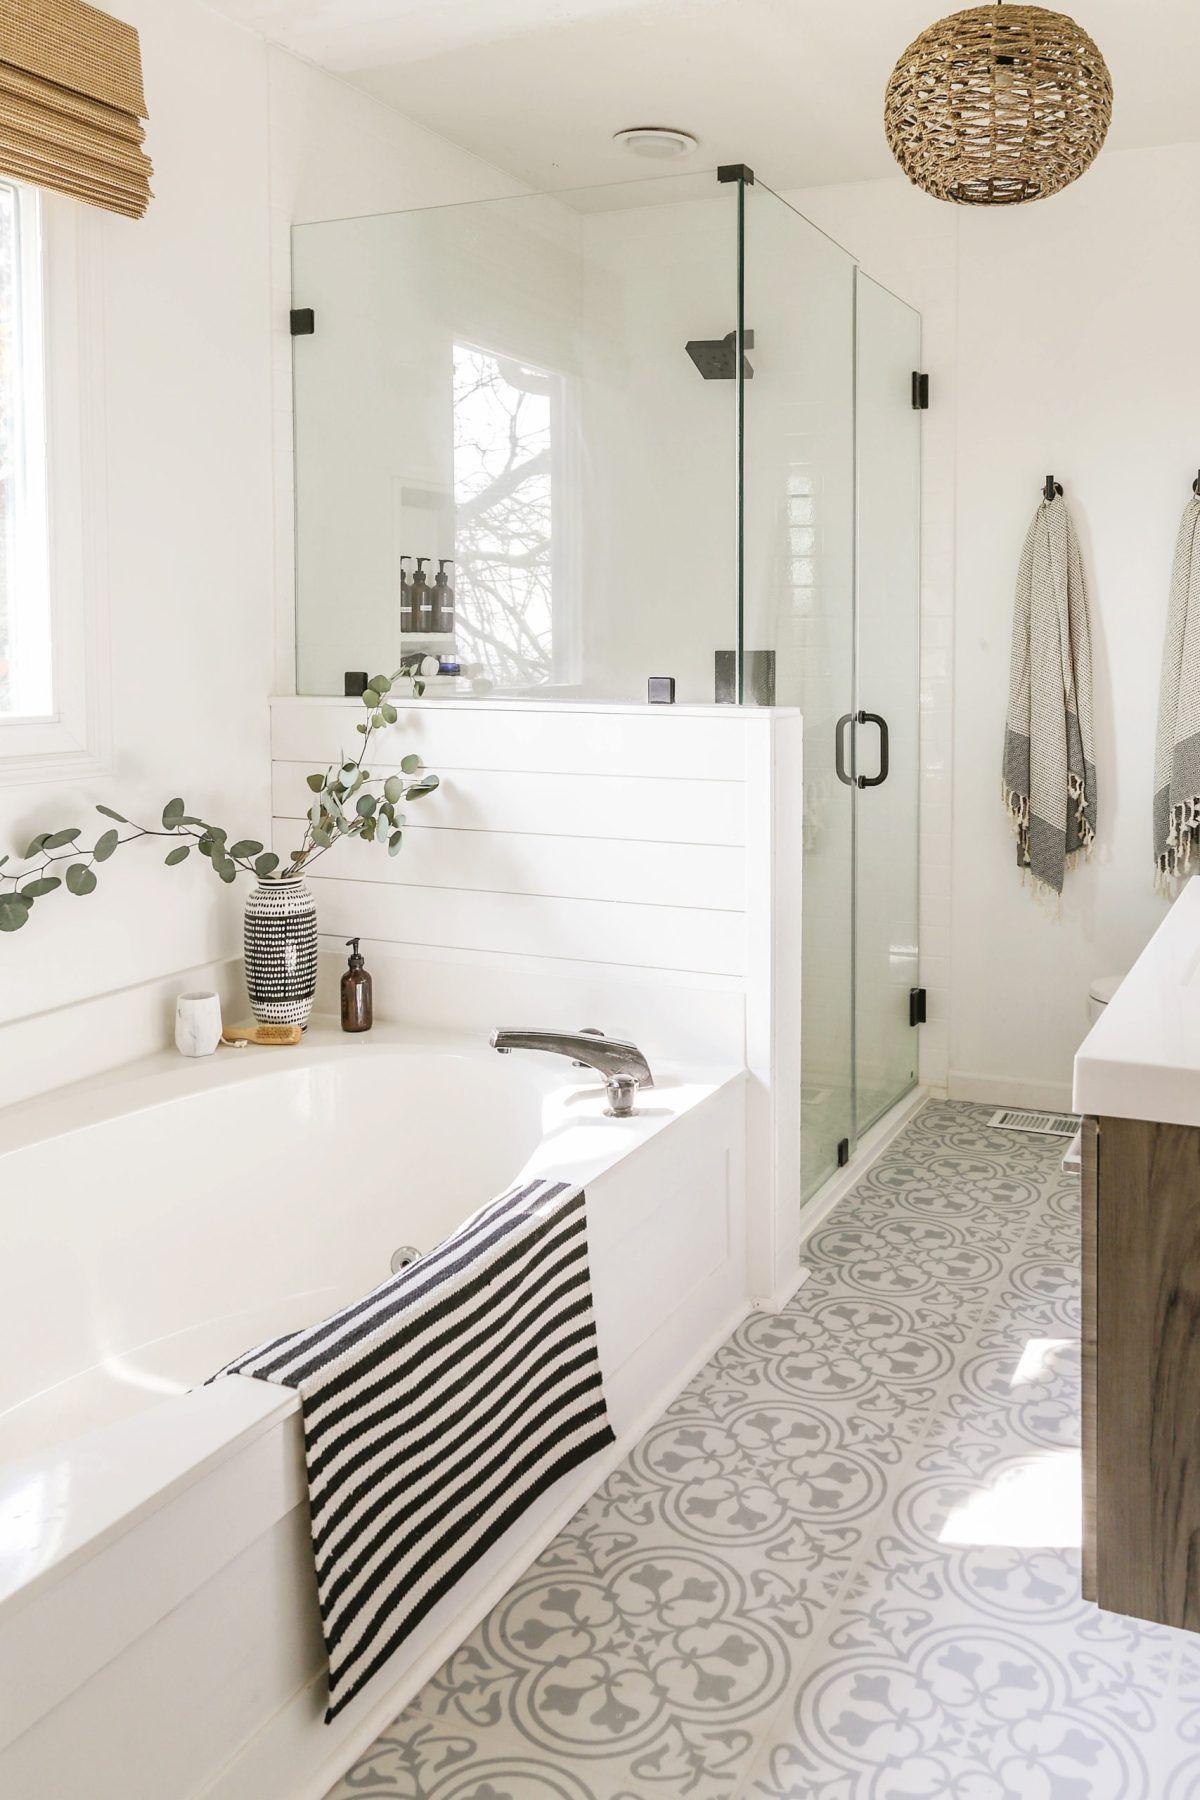 Reveal Boho Farmhouse Master Bathroom Remodel With Decor Sources In 2020 Bathroom Interior Design Bathroom Remodel Master Farmhouse Master Bathroom